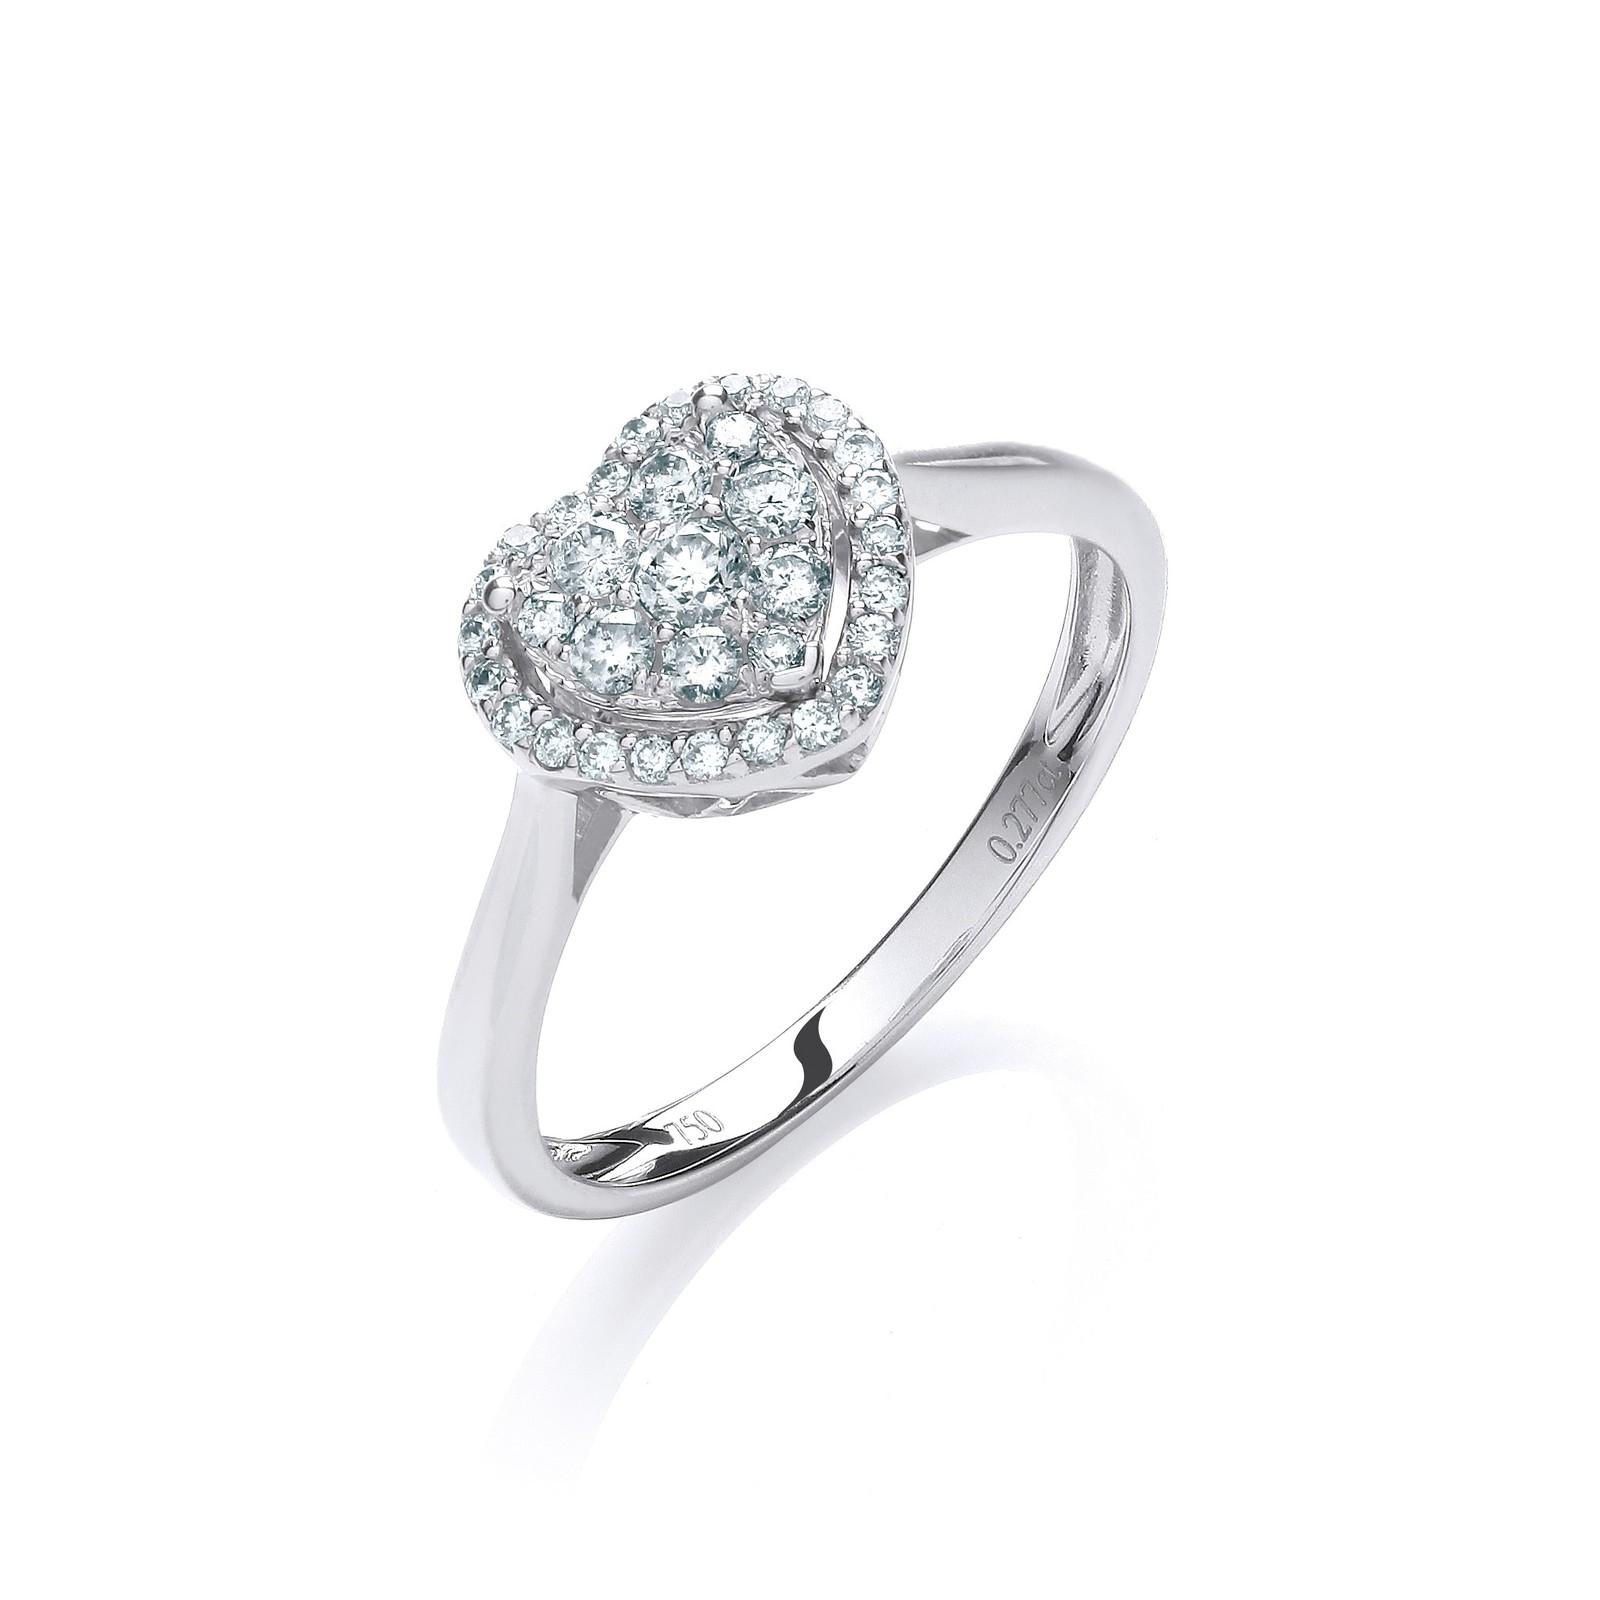 18ct White Gold 0.25ct Diamond Heart Ring